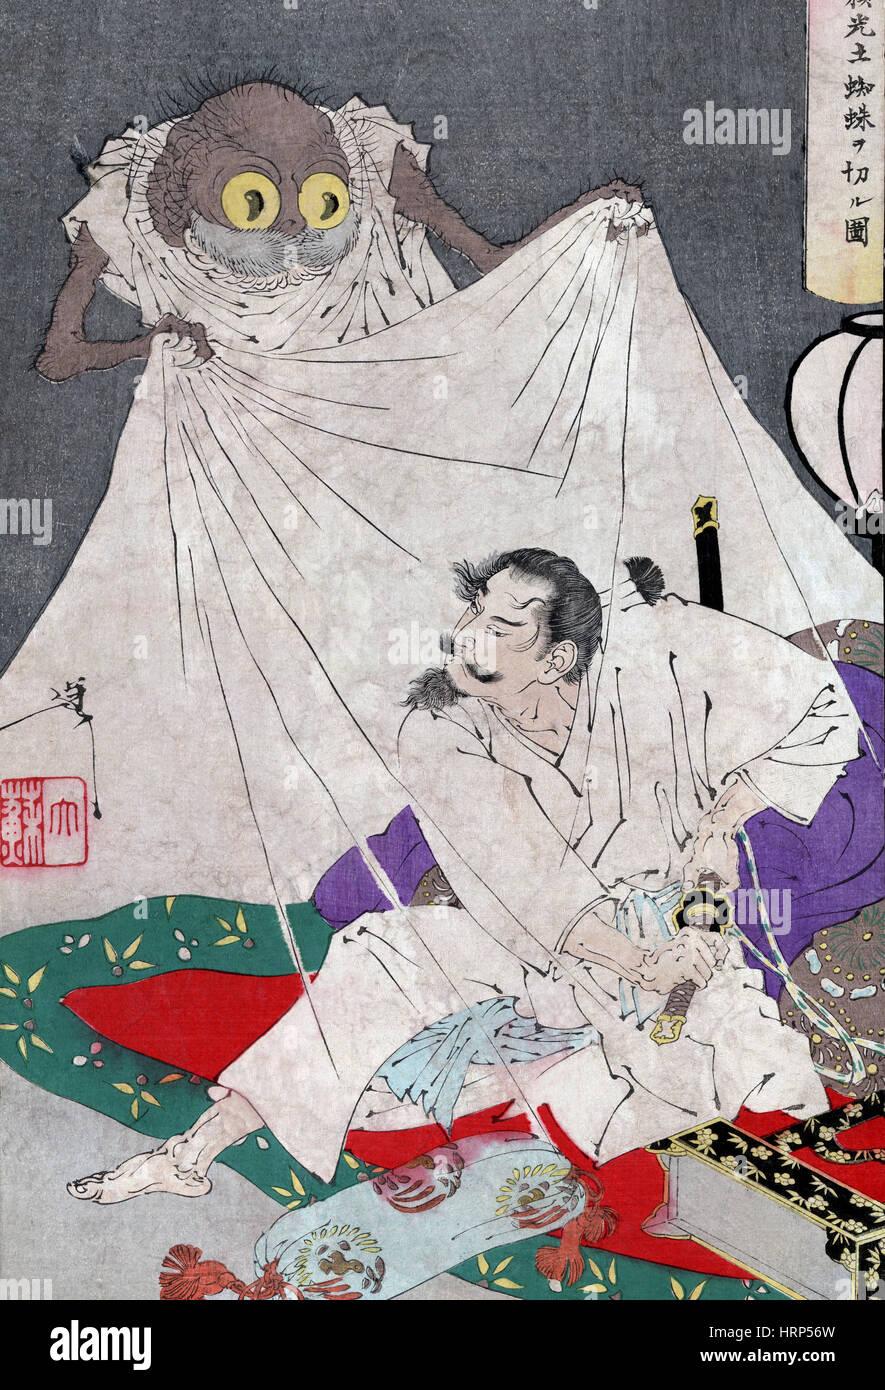 Tsuchigumo, japanischen Folklore Stockbild